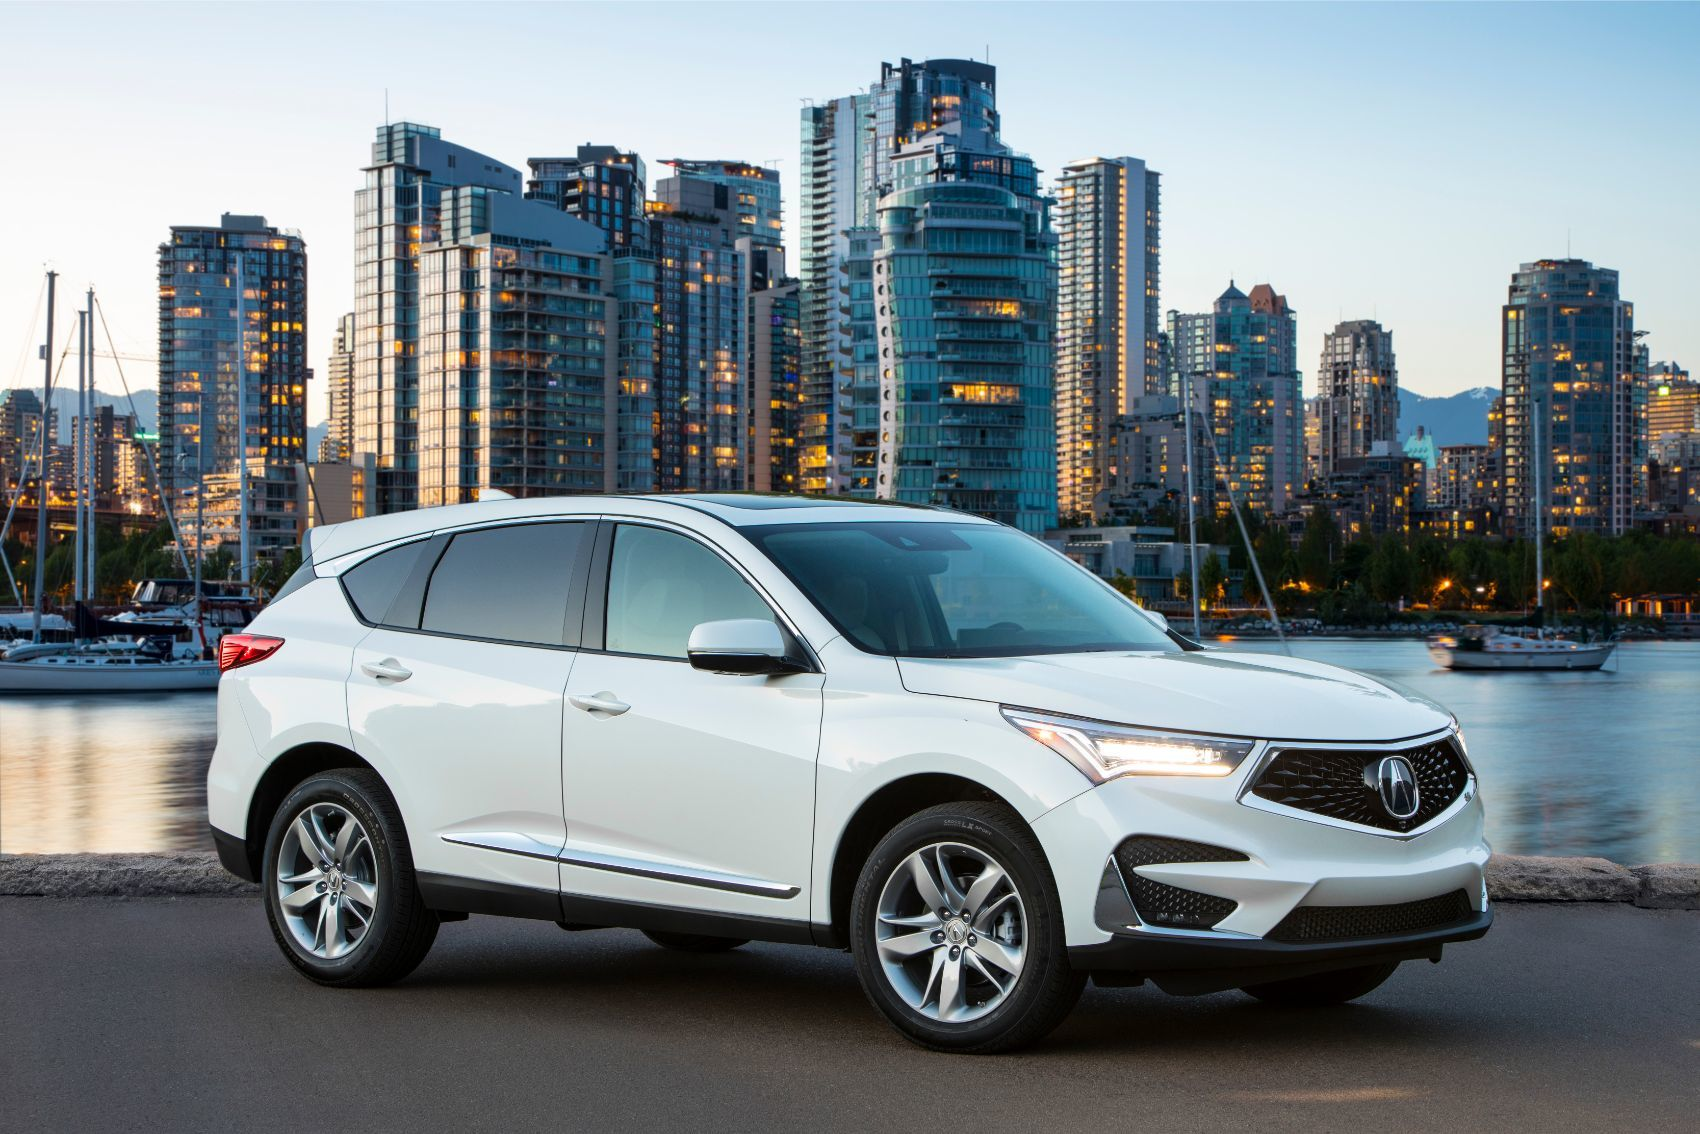 2020 Acura Rdx Hits Dealerships A Brief Walk Around